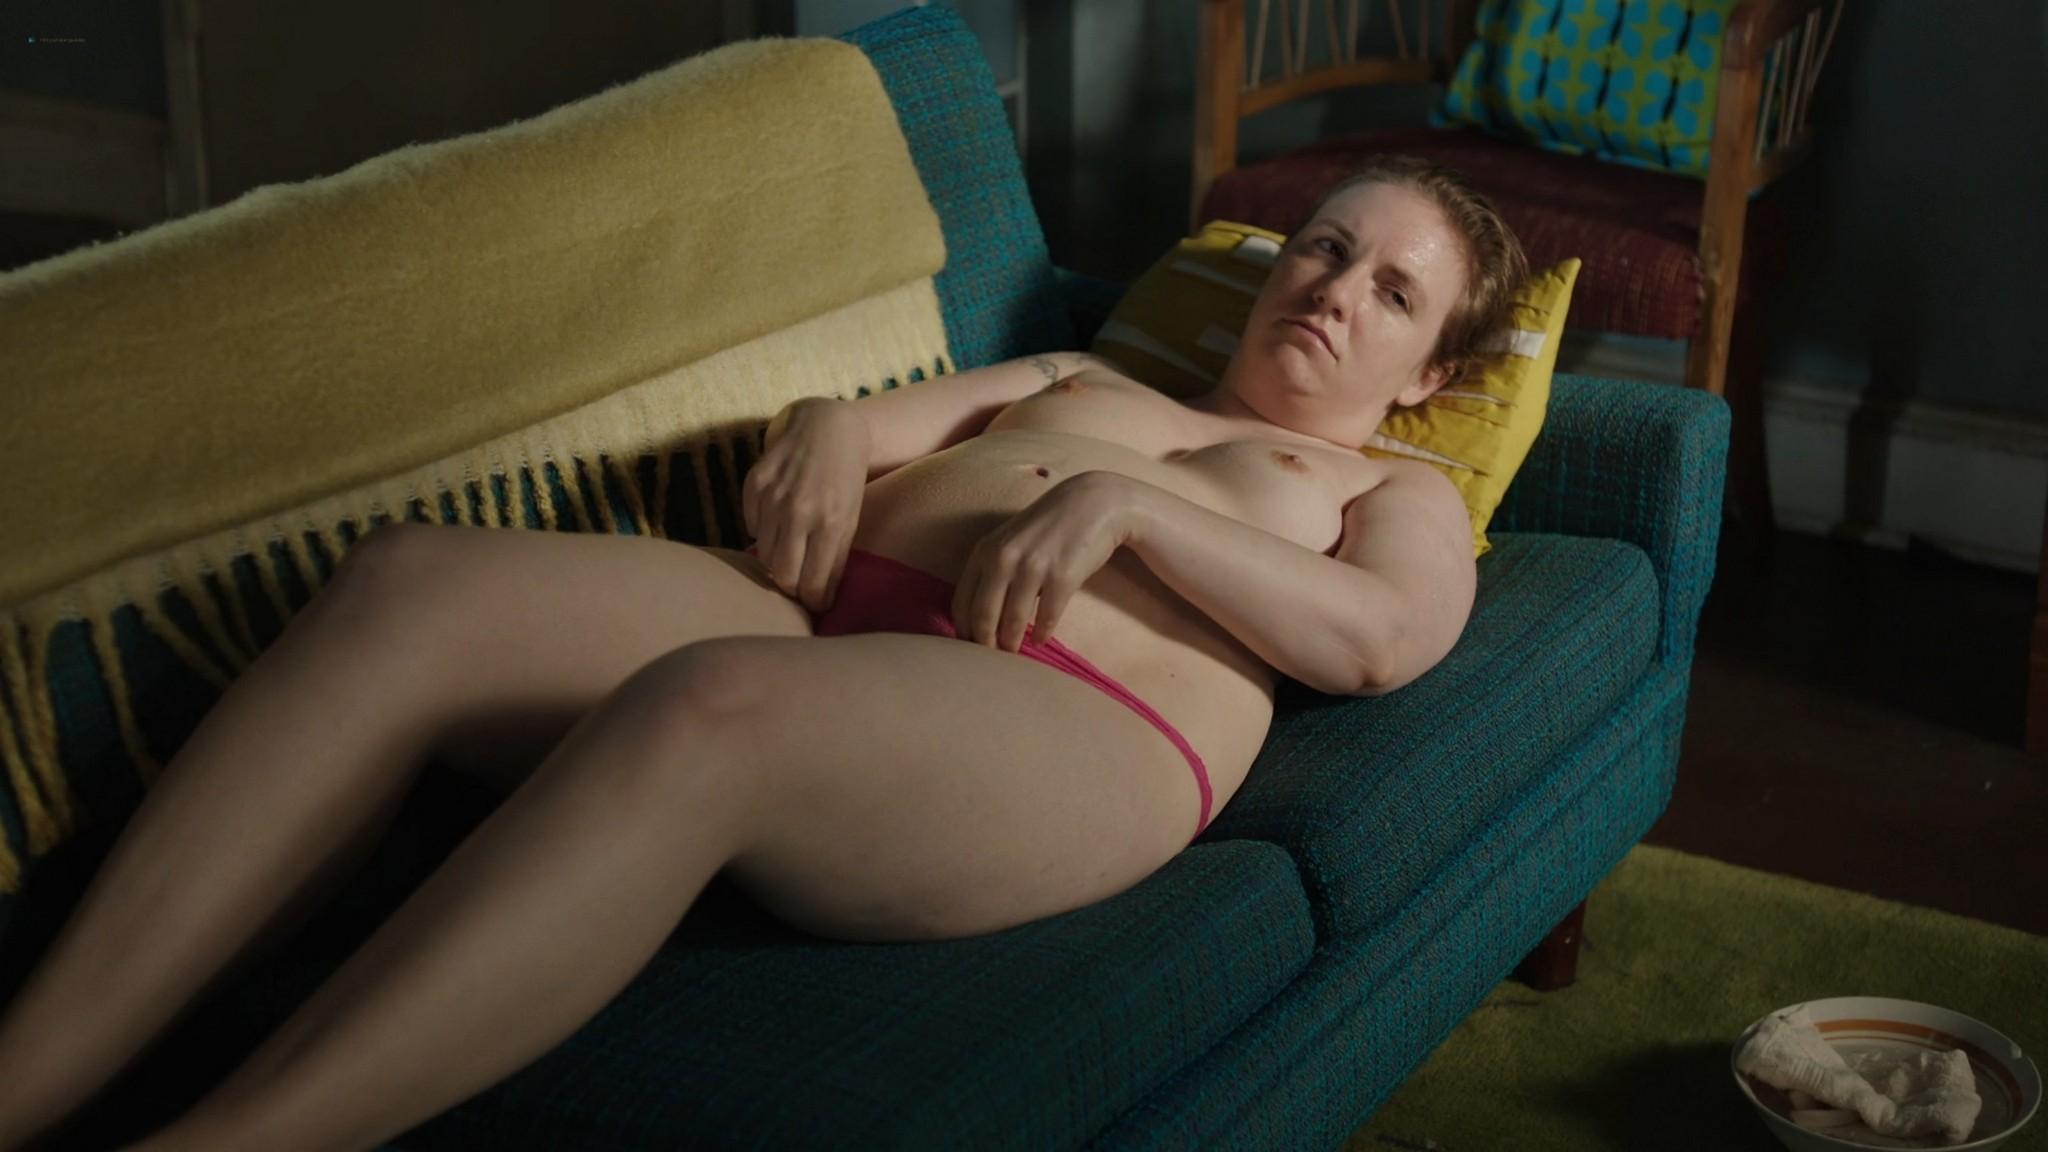 Lena Dunham nude bush Jemima Kirke nude Allison Williams sexy Girls 2012 s6e5 10 1080p Web 5